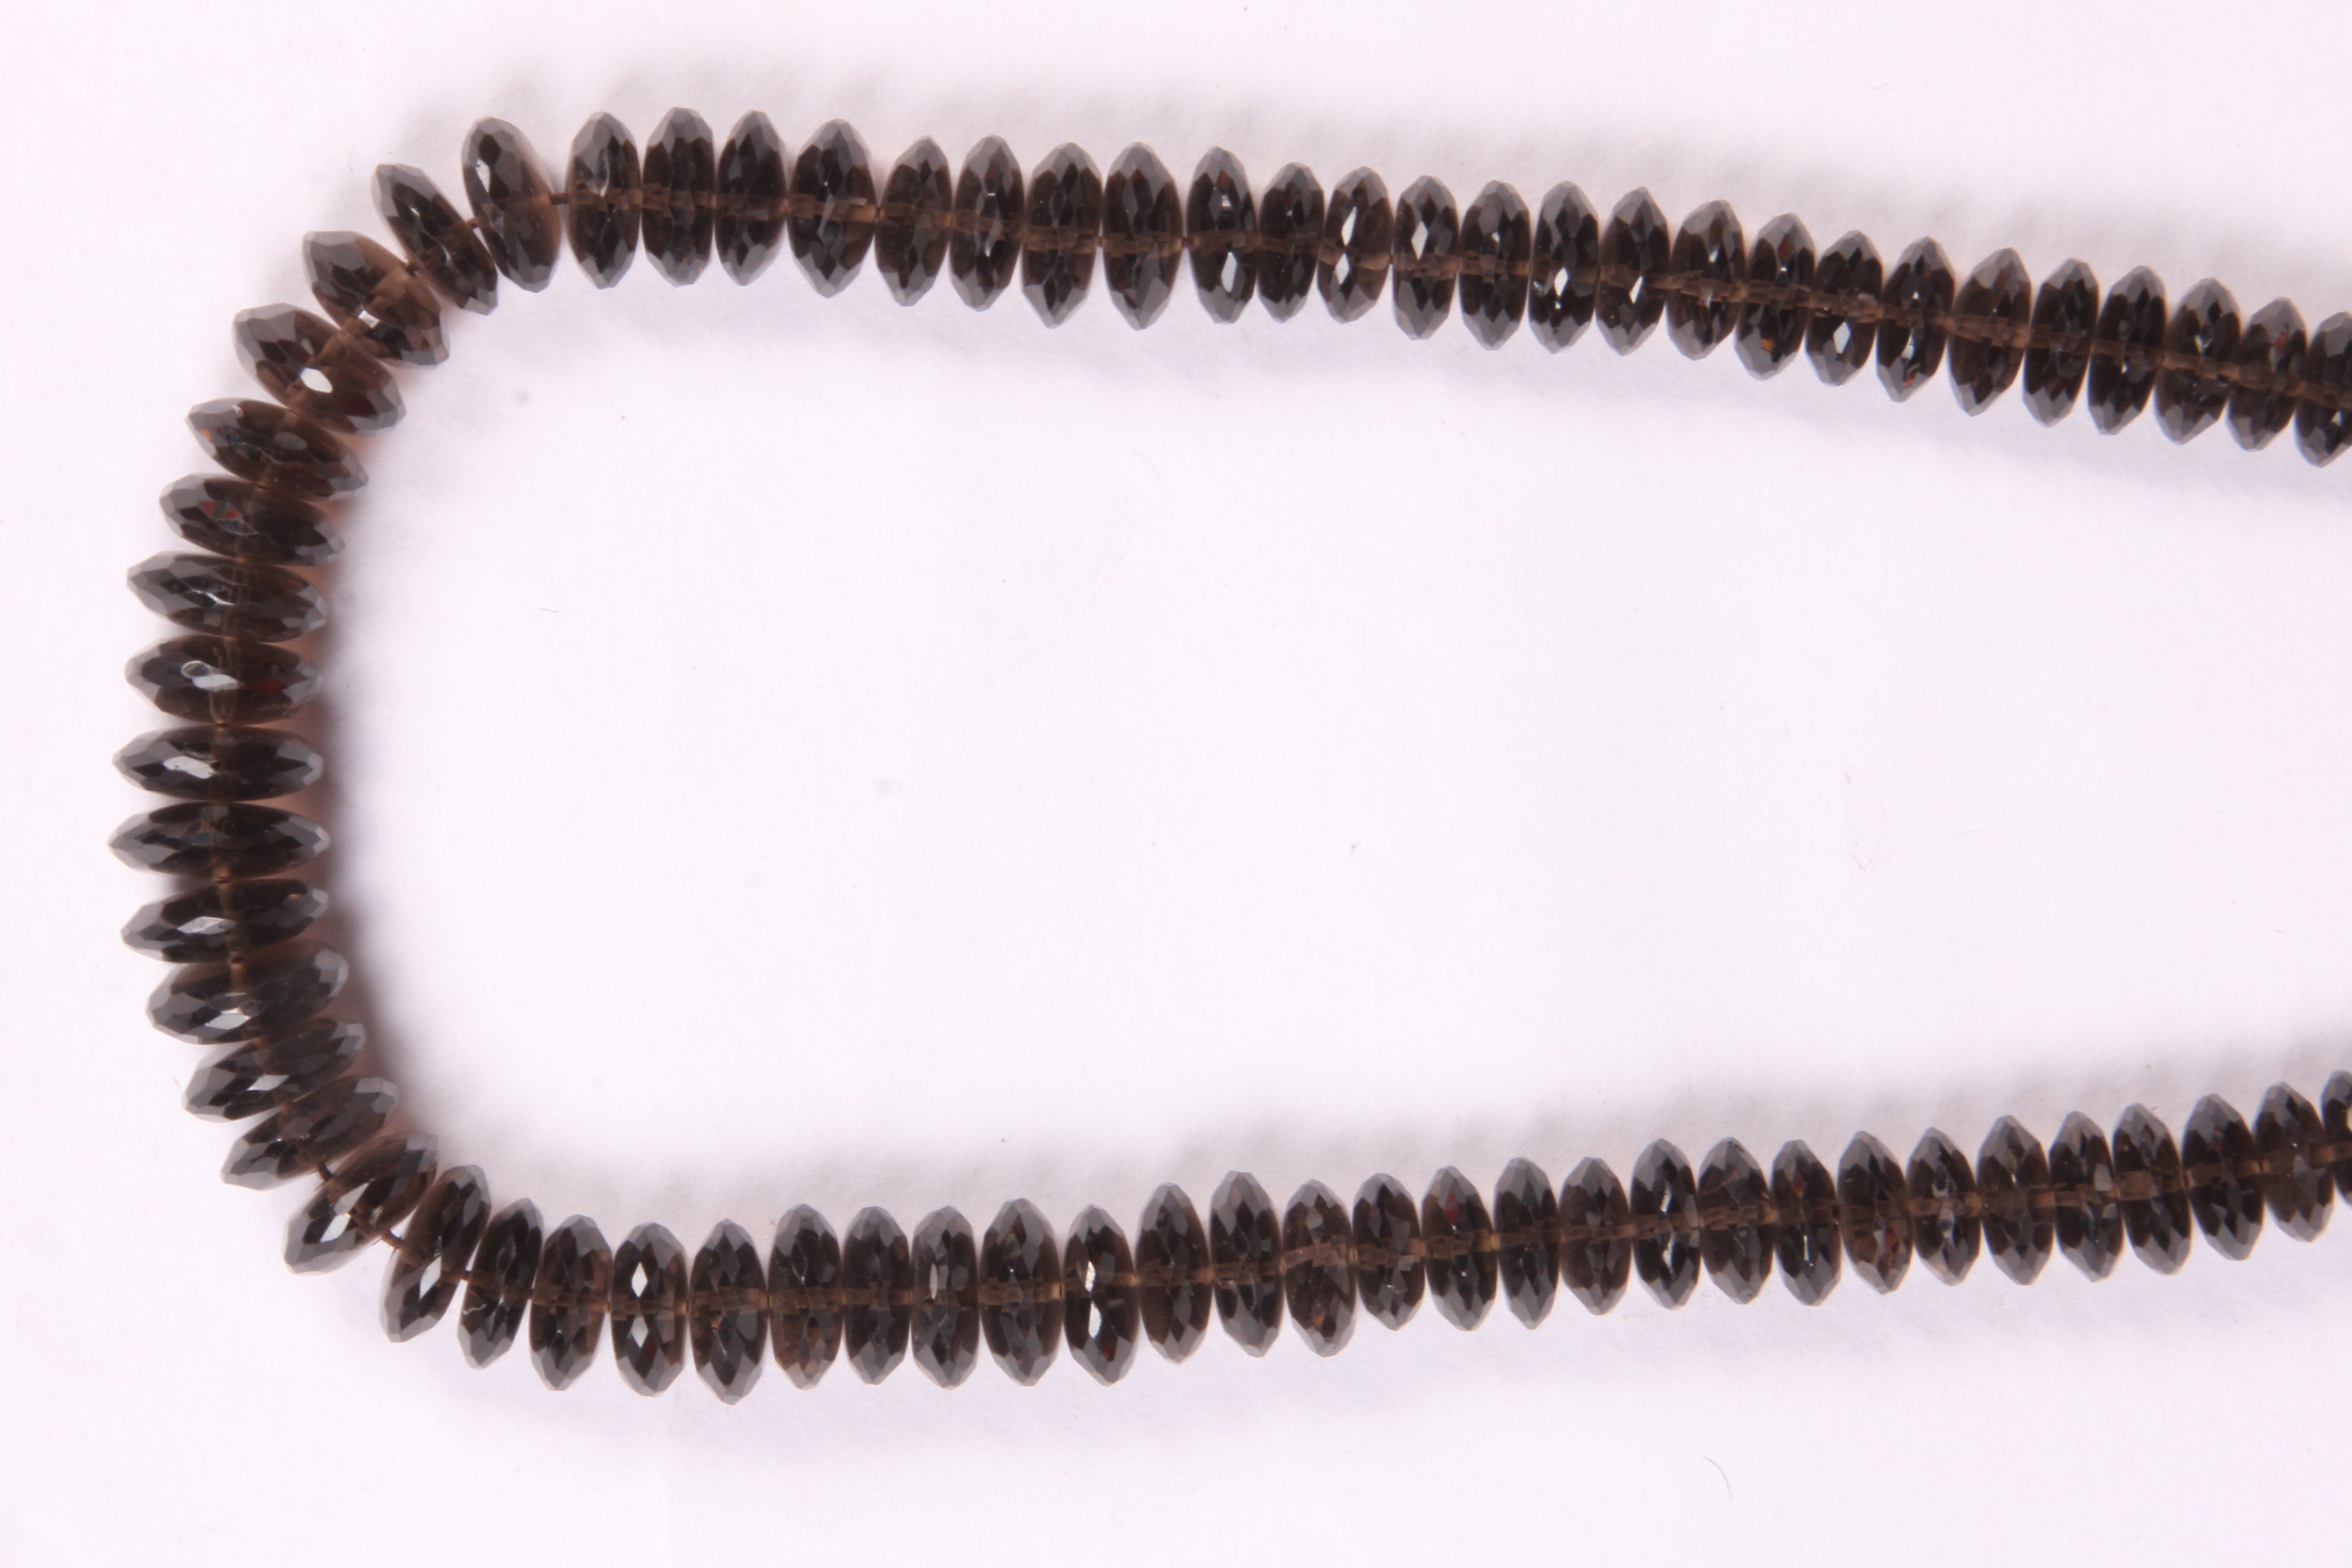 Smoky Quartz German Cut Beads